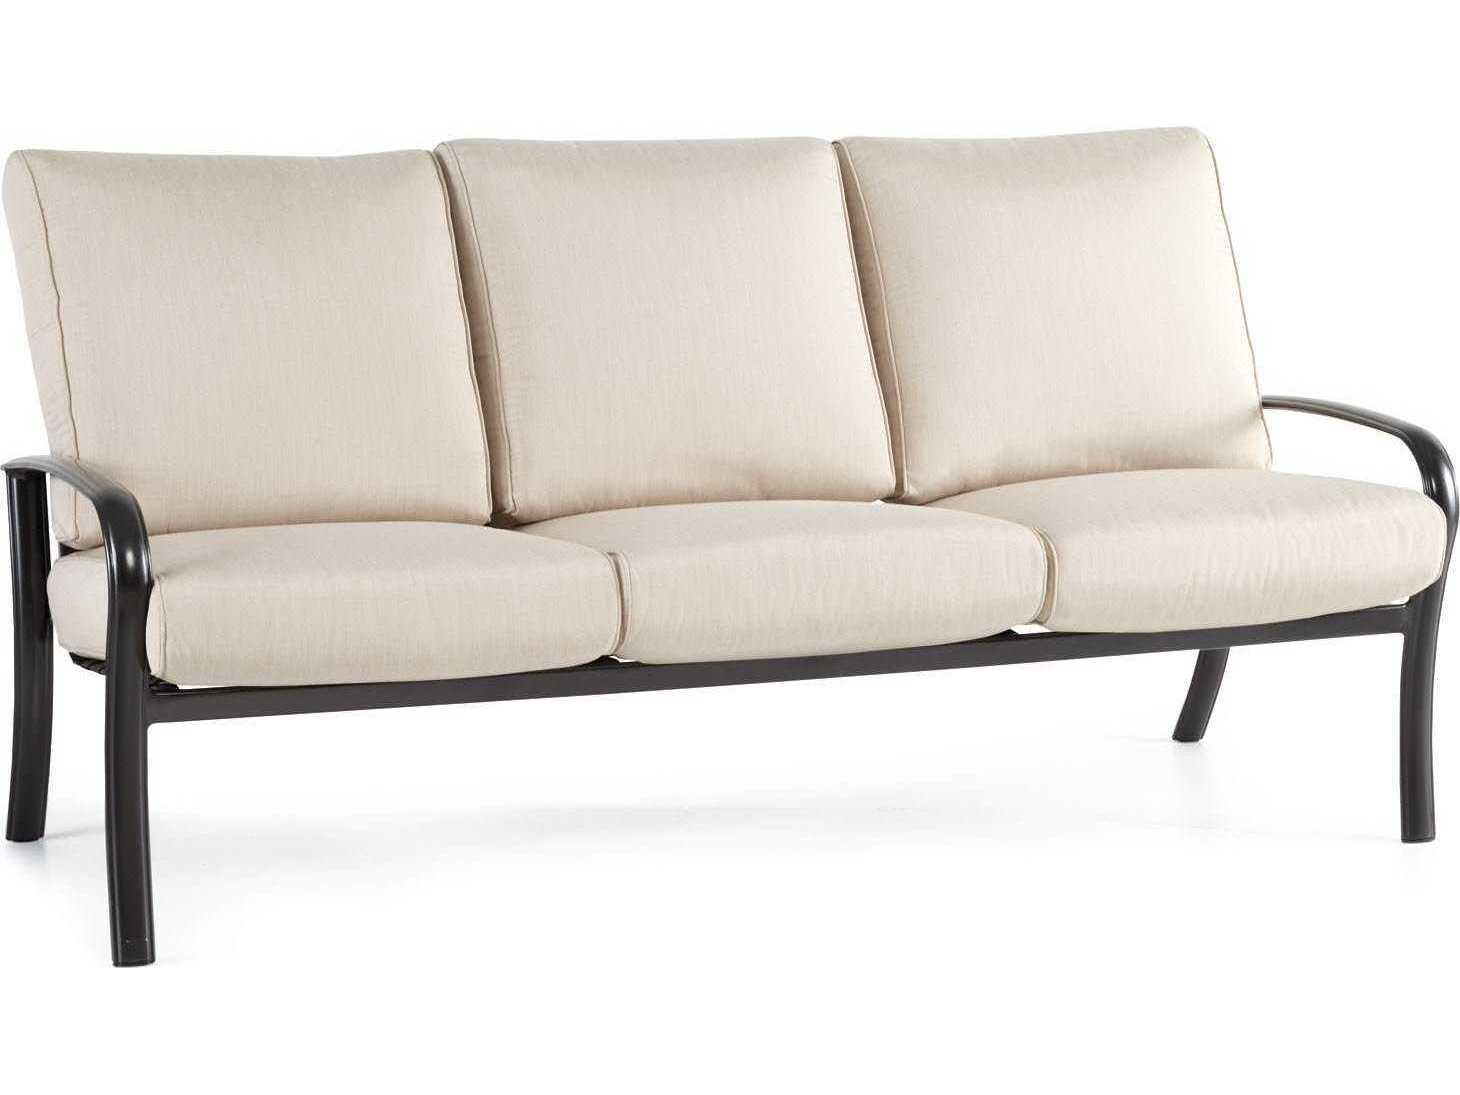 glider sofa modern fabric set winston savoy cushion aluminum m24031